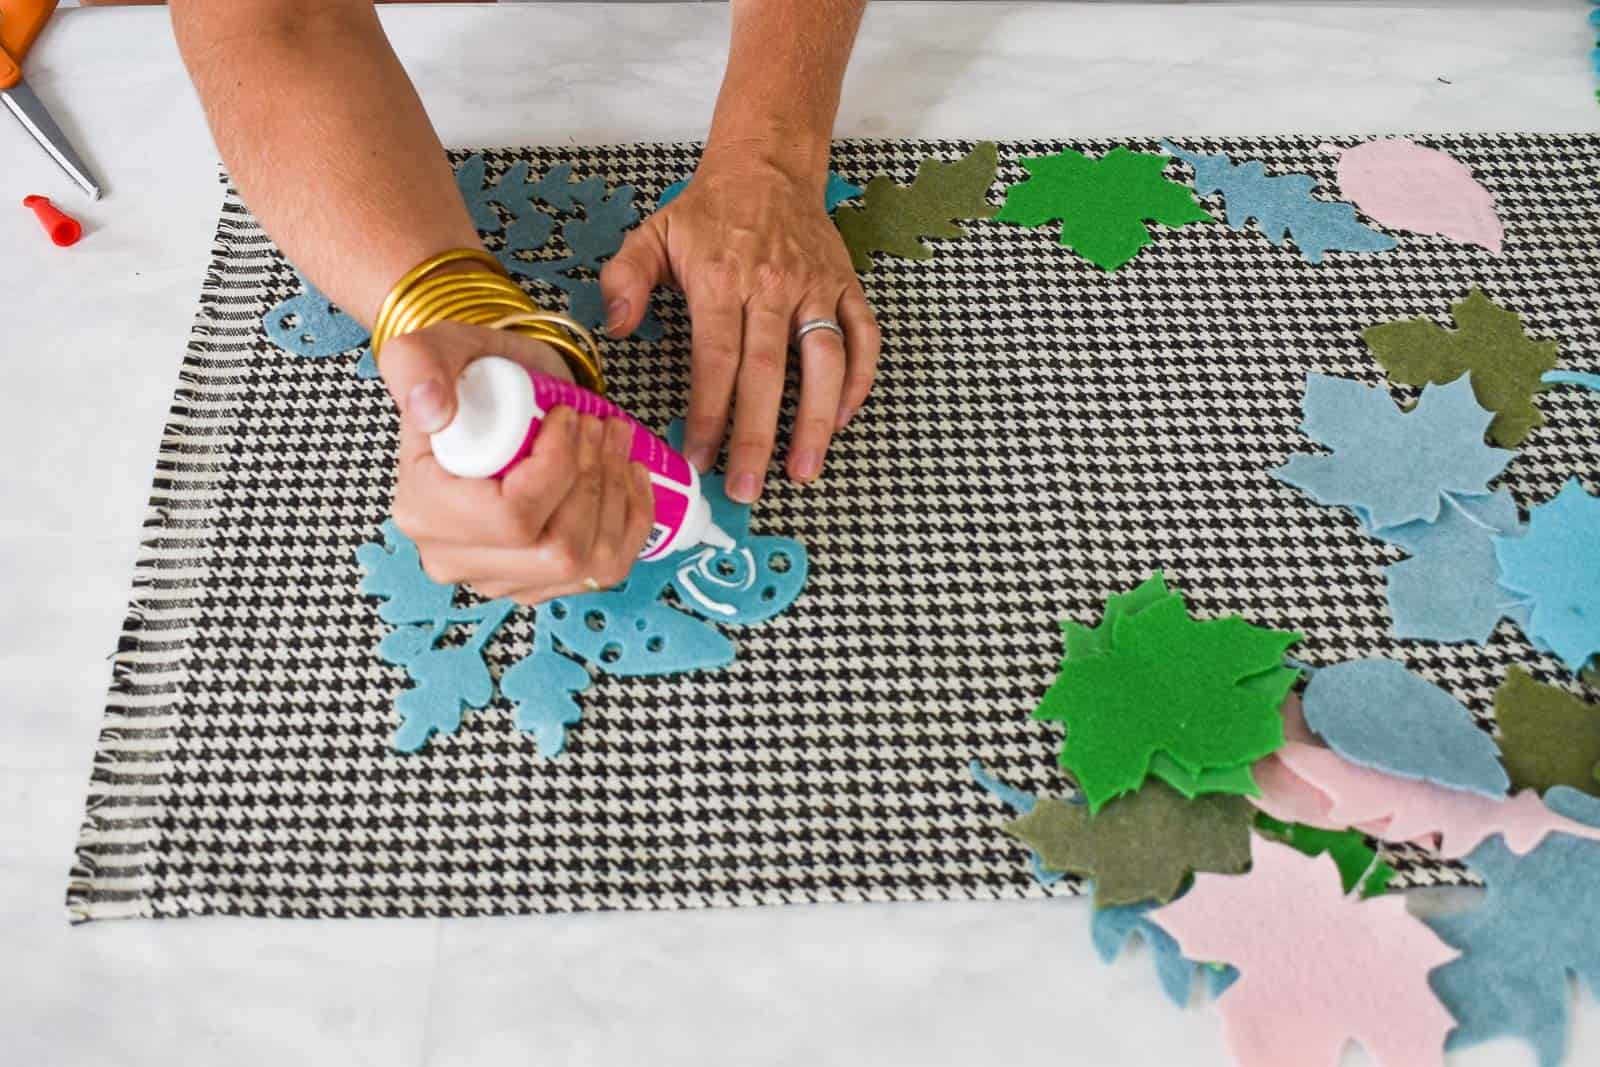 fabric glue to attach felt leaves